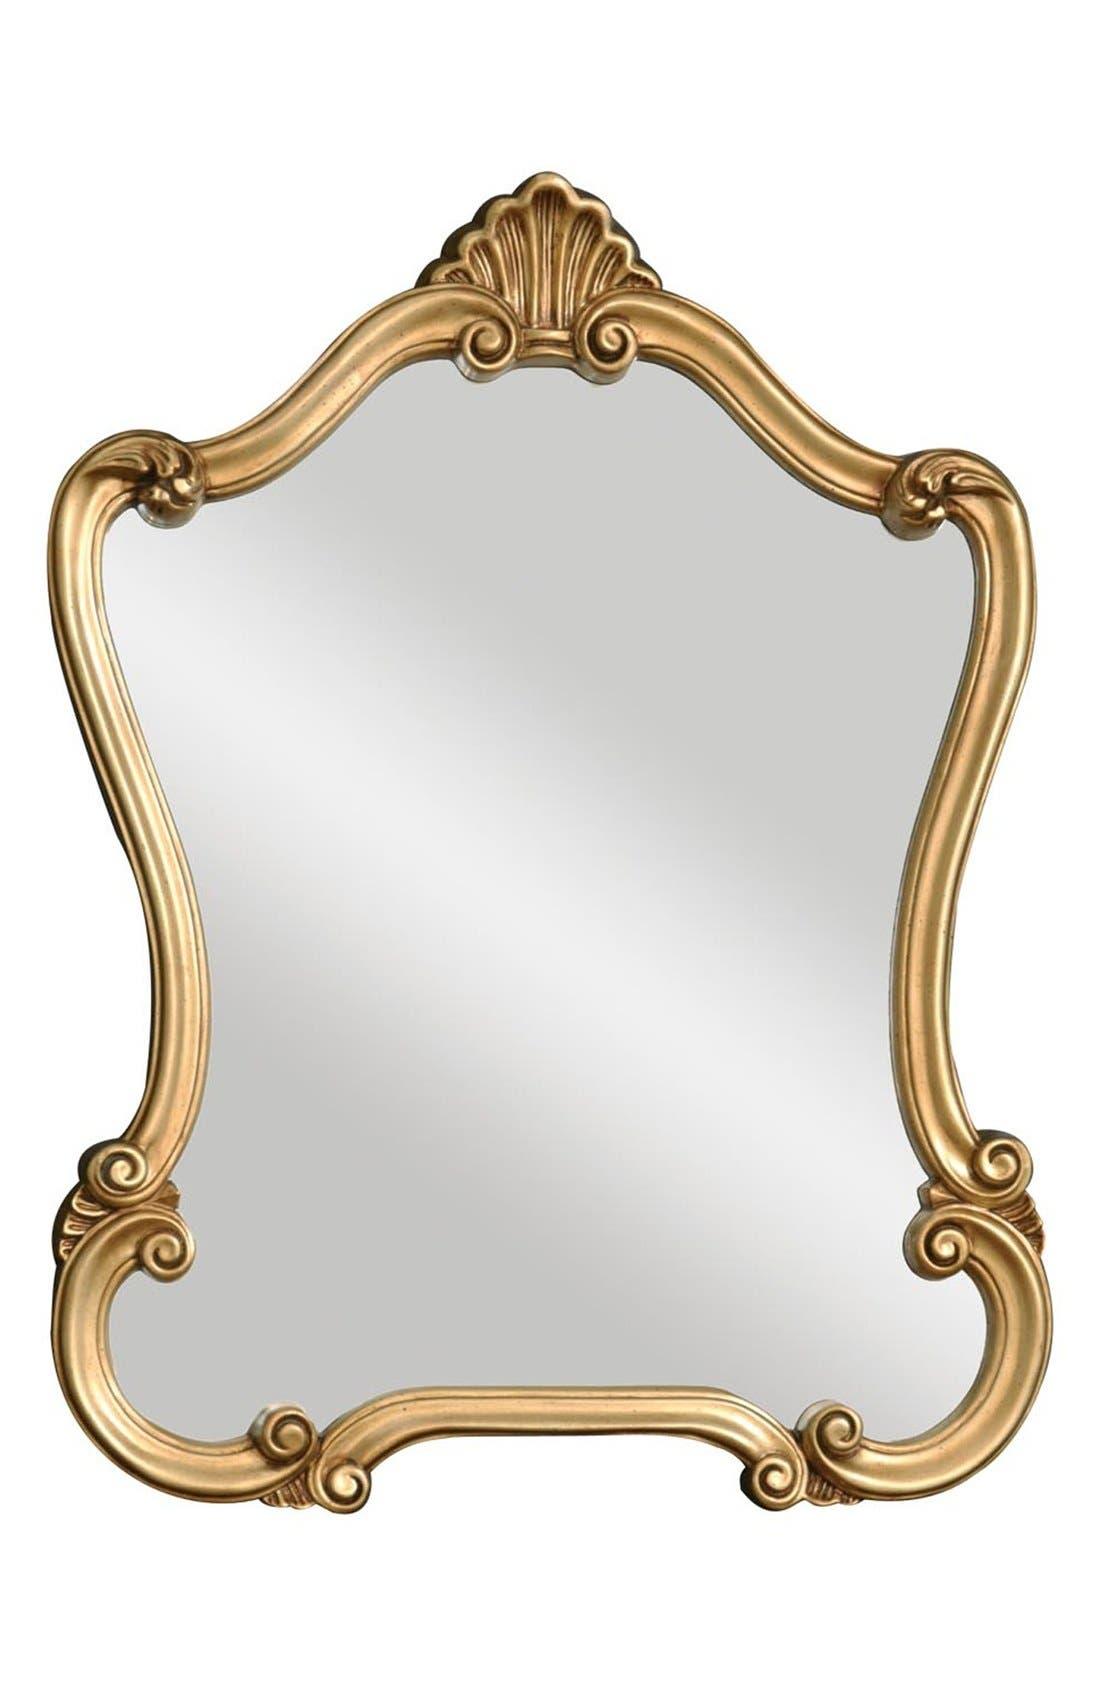 Alternate Image 1 Selected - Uttermost 'Walton Hall' Antiqued Goldtone Vanity Mirror